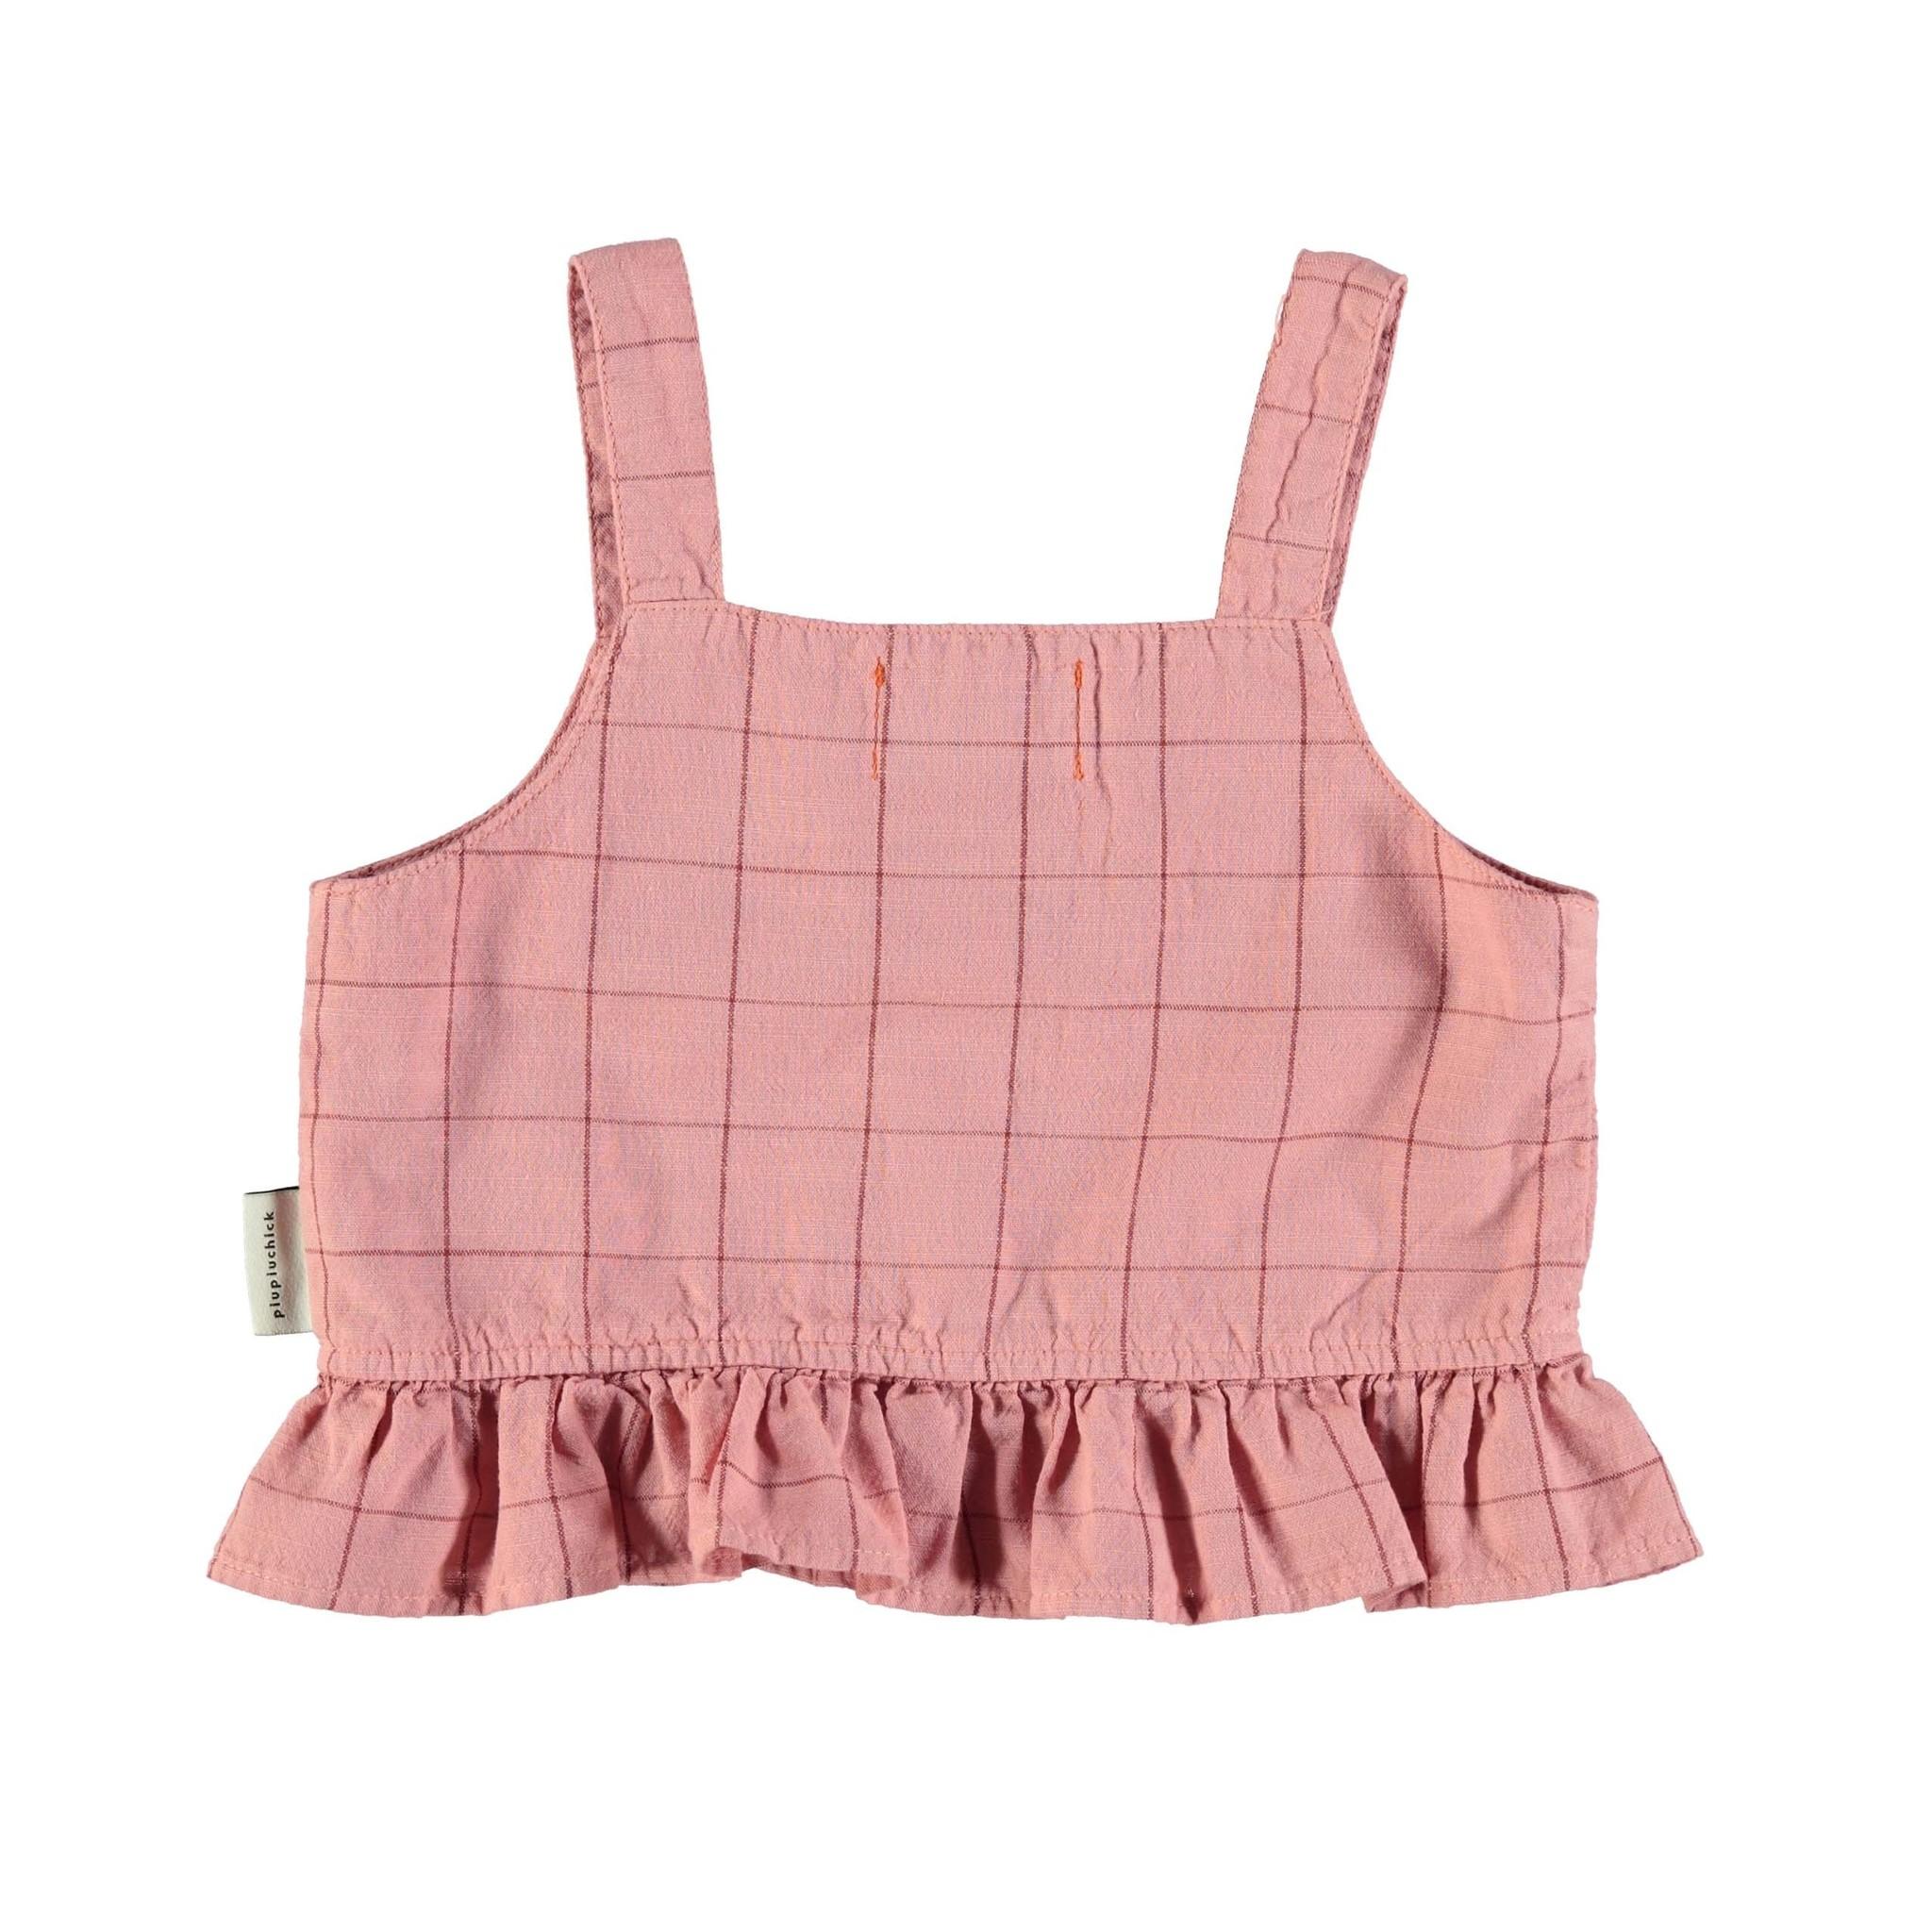 piupiuchick top   pink & garnet checkered